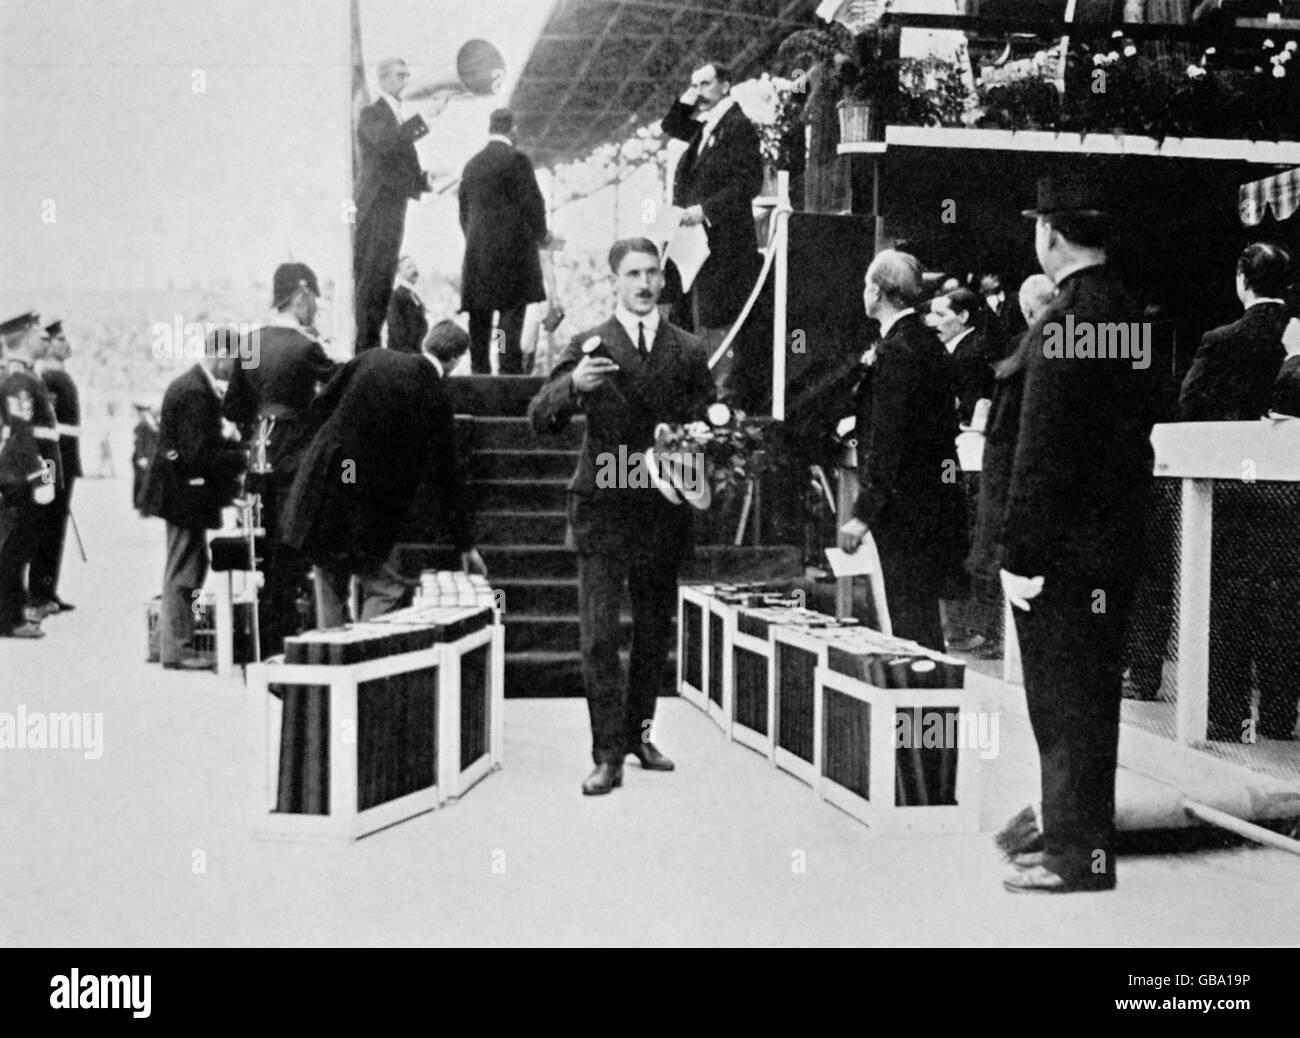 Athletics - London Olympic Games 1908 - Men's 400m Final - Stock Image